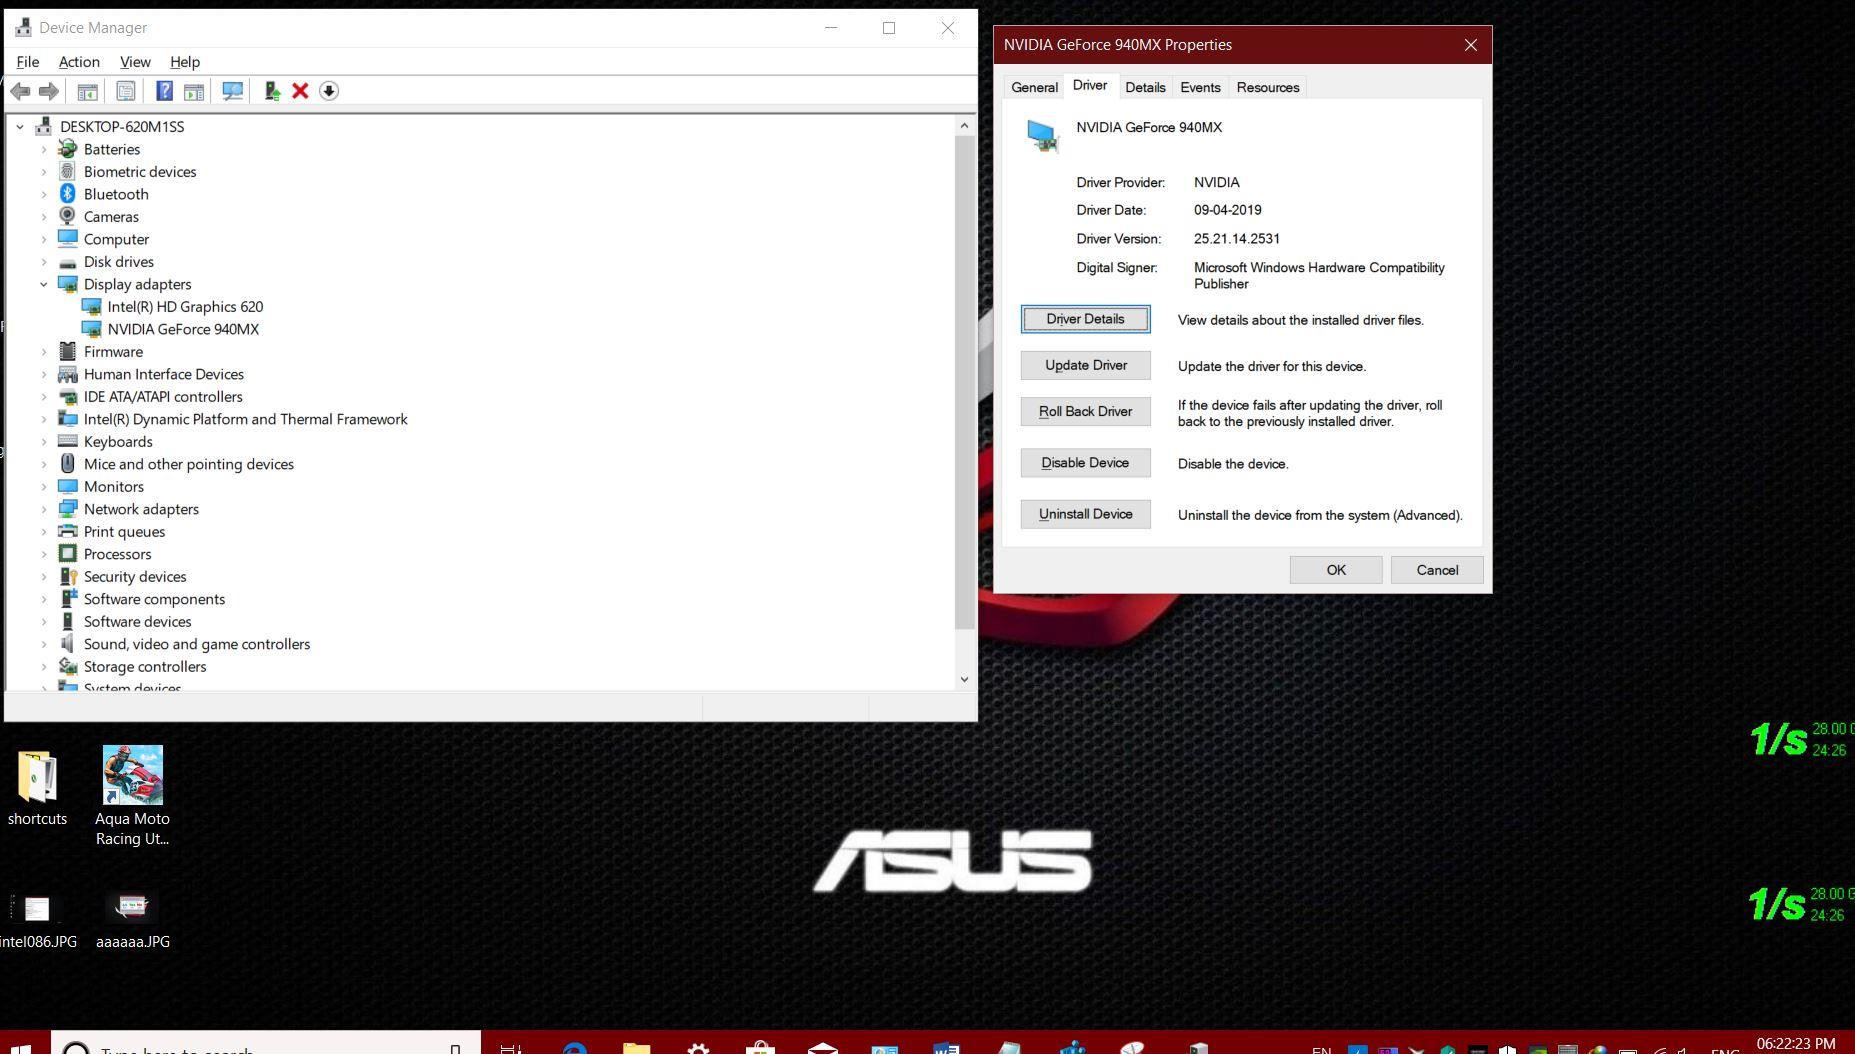 Nvidia Inc Released new Geforce DCH & STANDARD WHQL Driver v452.06 for Notebooks GPU'S &... b974e1e6-c9ee-44aa-a001-3e447b867de1?upload=true.jpg